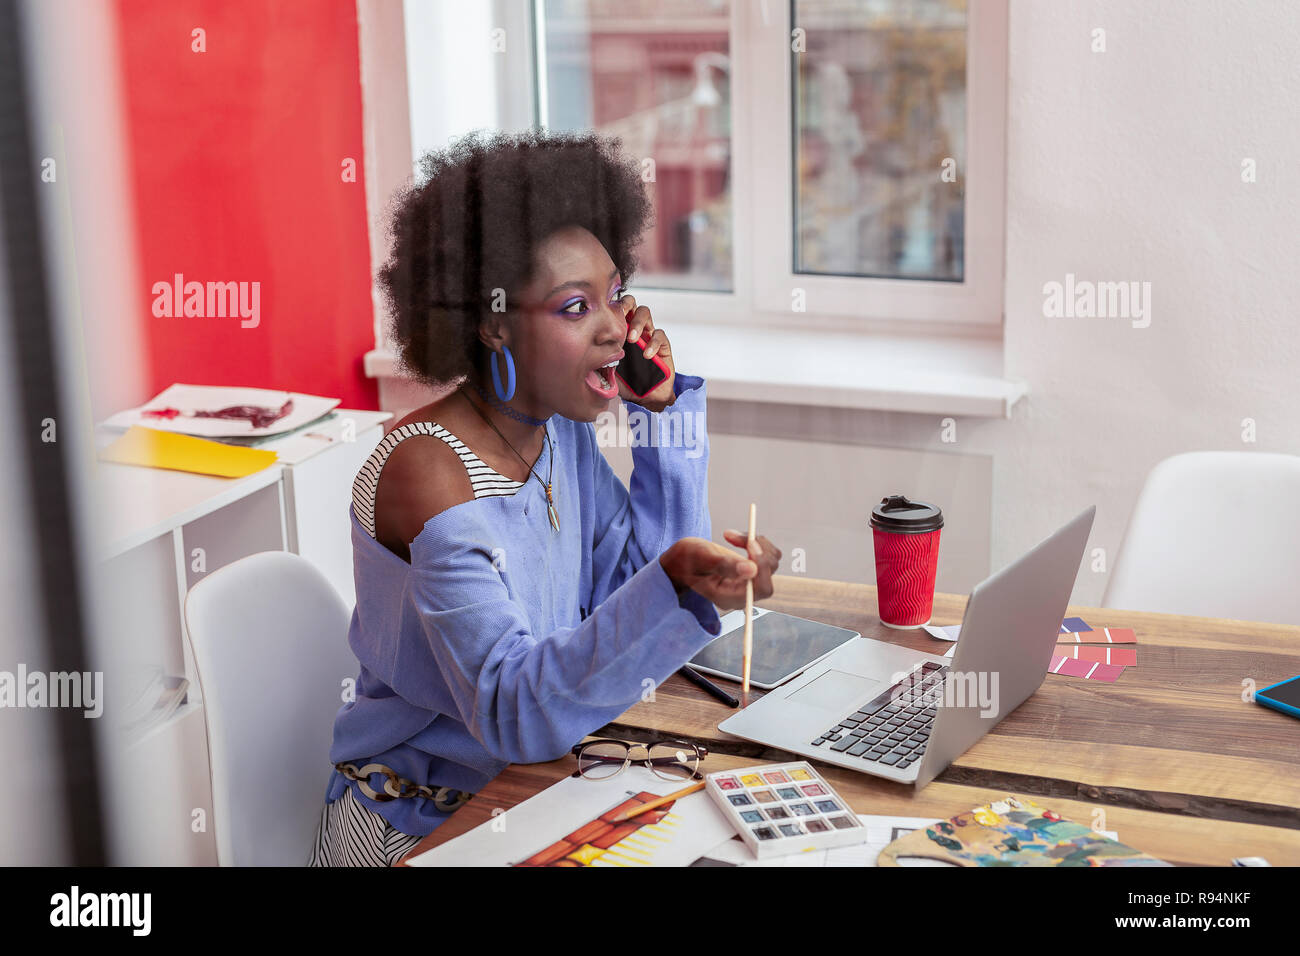 African American Interior Designer Wearing Blue Sweater Feeling Surprised Stock Photo Alamy